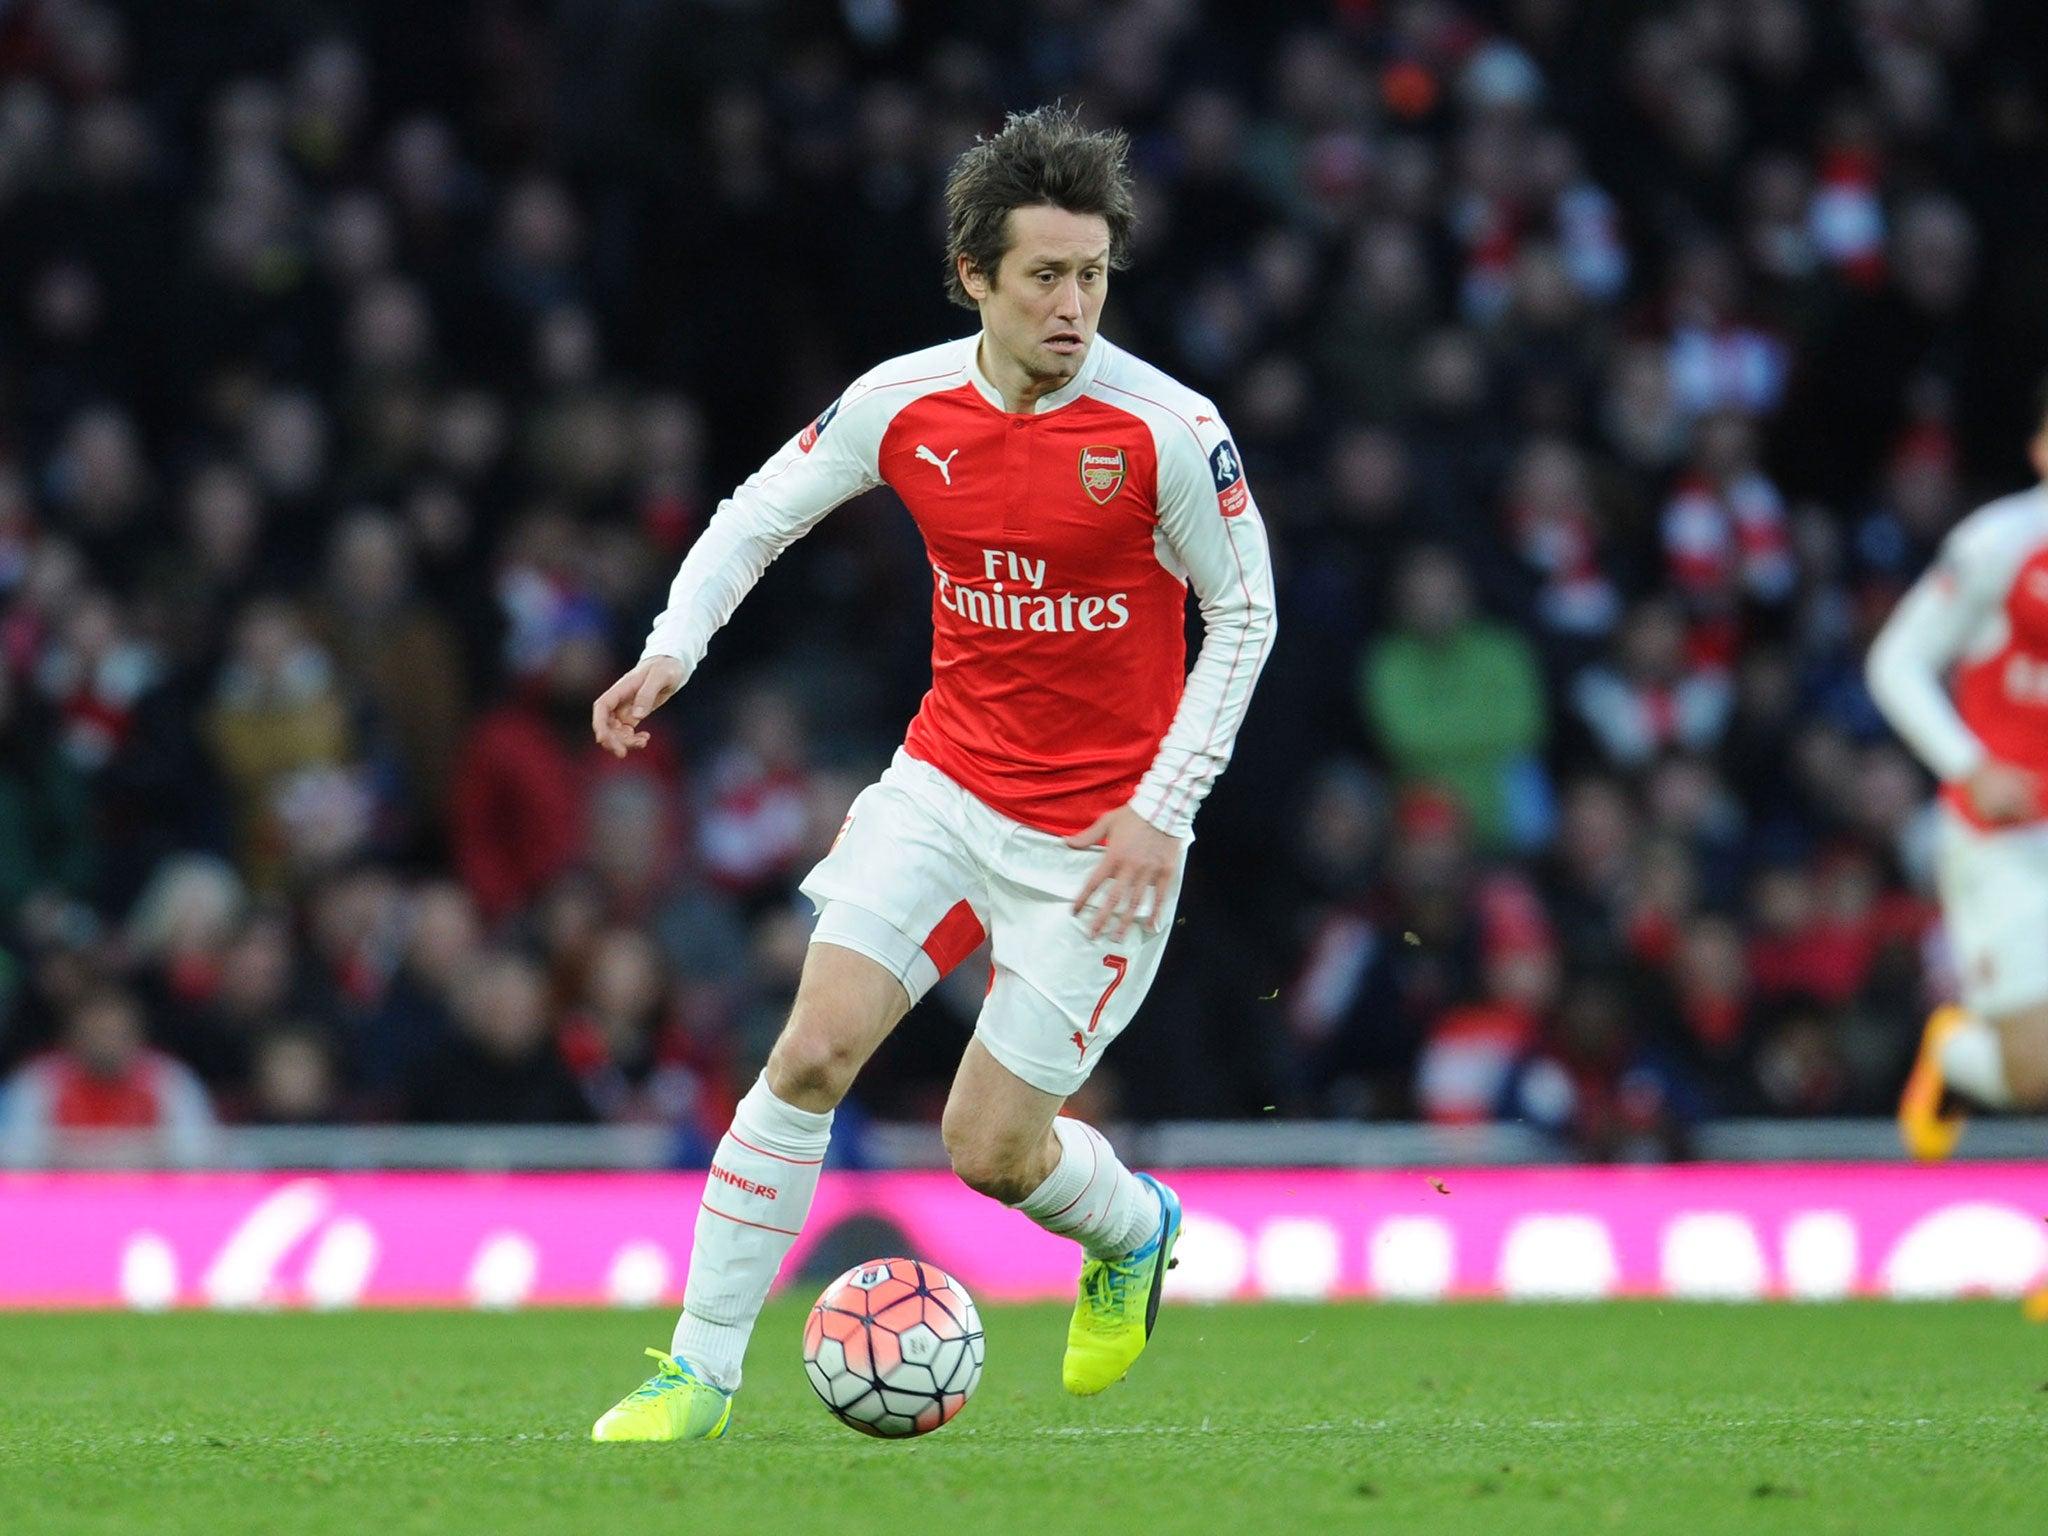 Arsenal injury news: Tomas Rosicky 'devastated' after ... Soccer News